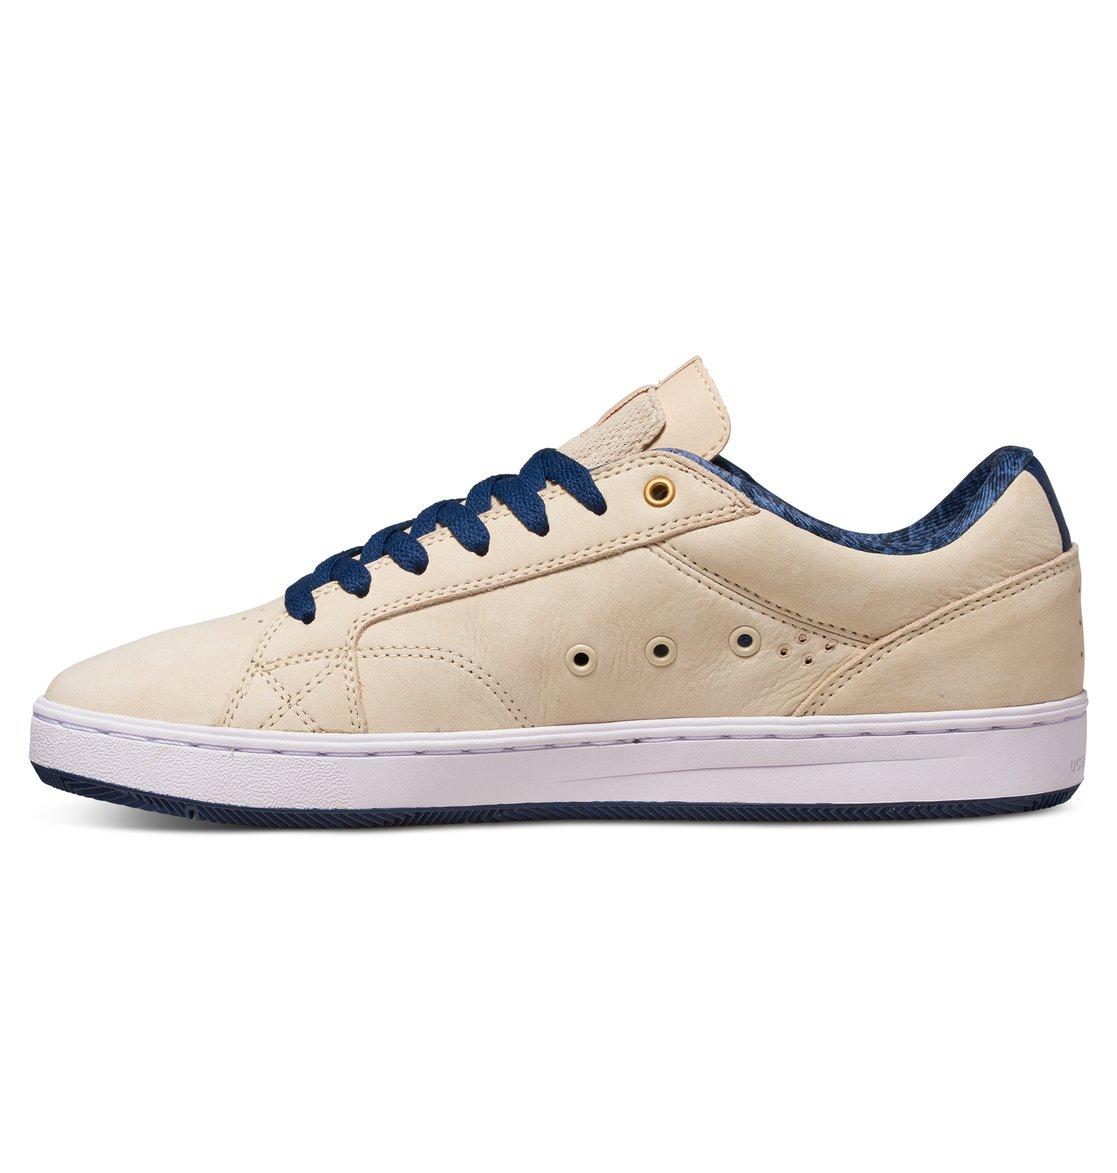 DC Shoes Lynnfield S - Skate Shoes - Chaussures de Skate - Homme